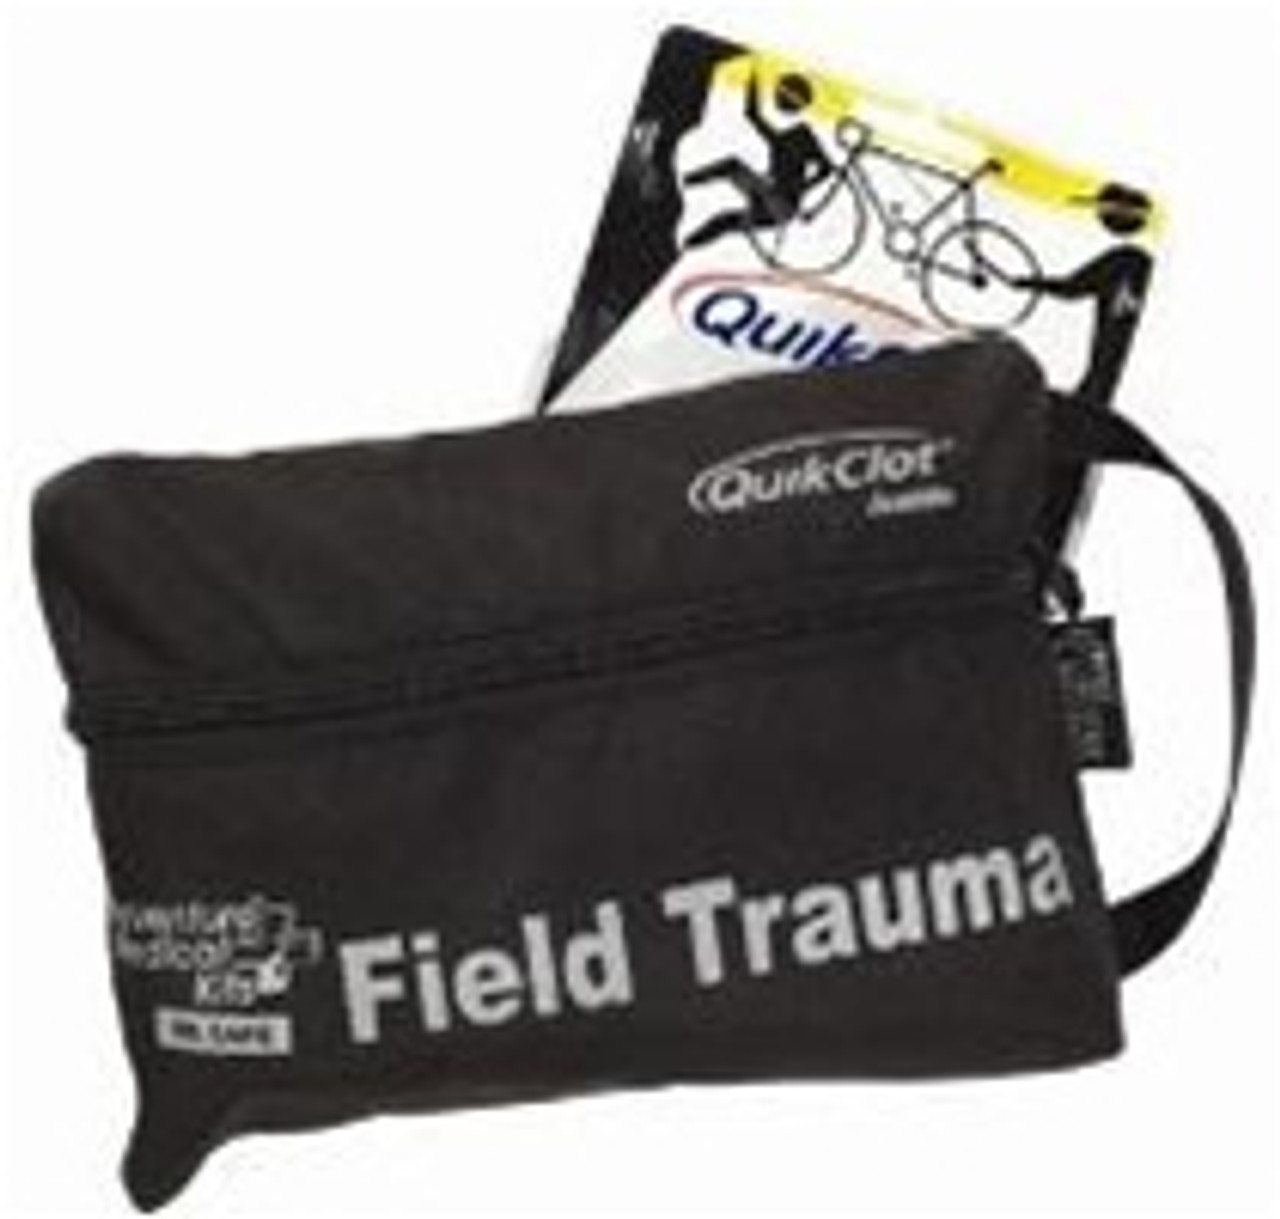 Adventure Medical Kits Tactical Field Trauma Kit with QuikClot